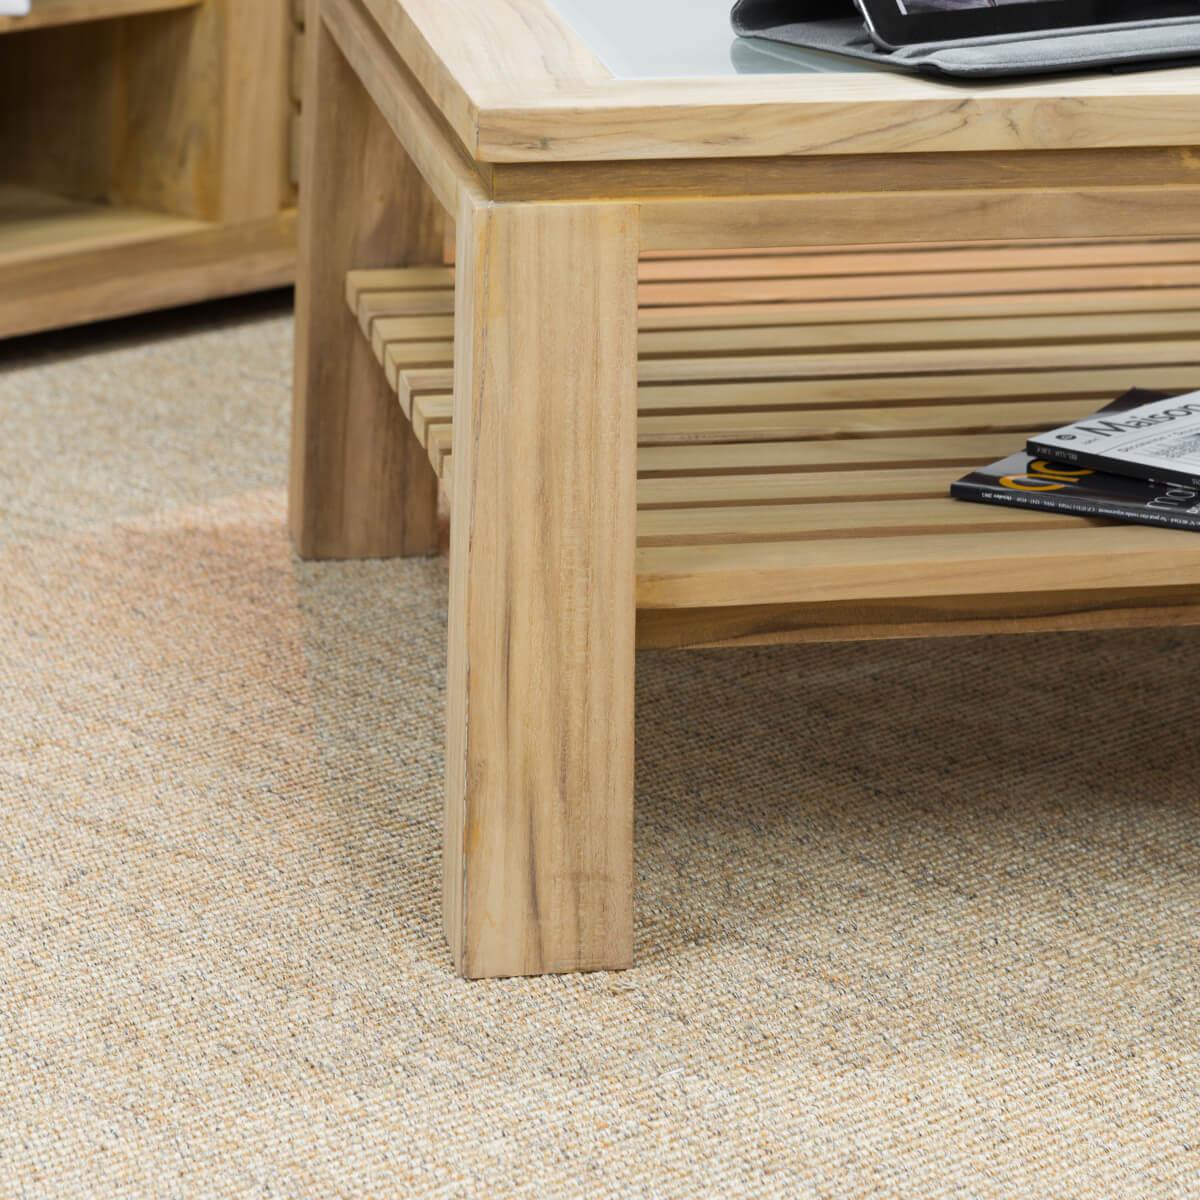 table basse carr e meuble en teck table basse en verre zen 80 cm. Black Bedroom Furniture Sets. Home Design Ideas